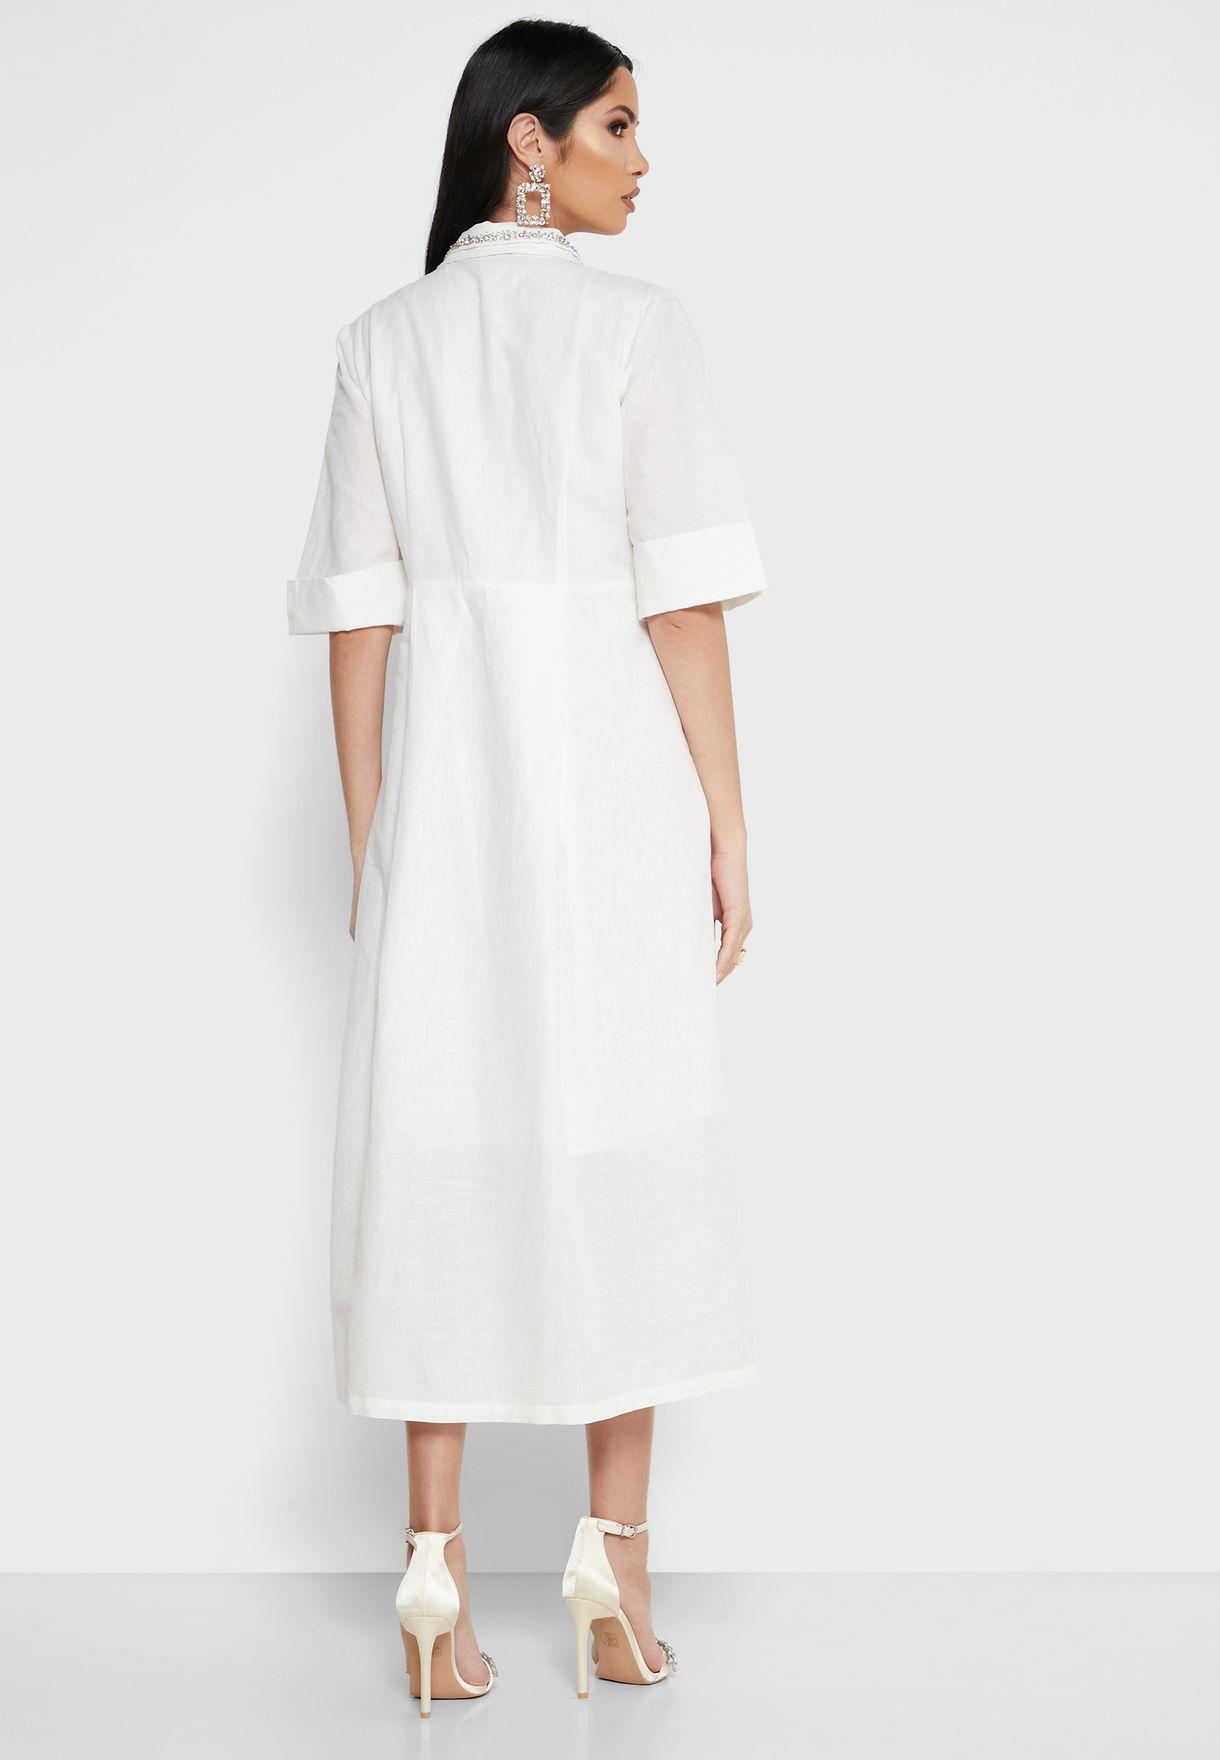 Embellished Collar Shirt Dress